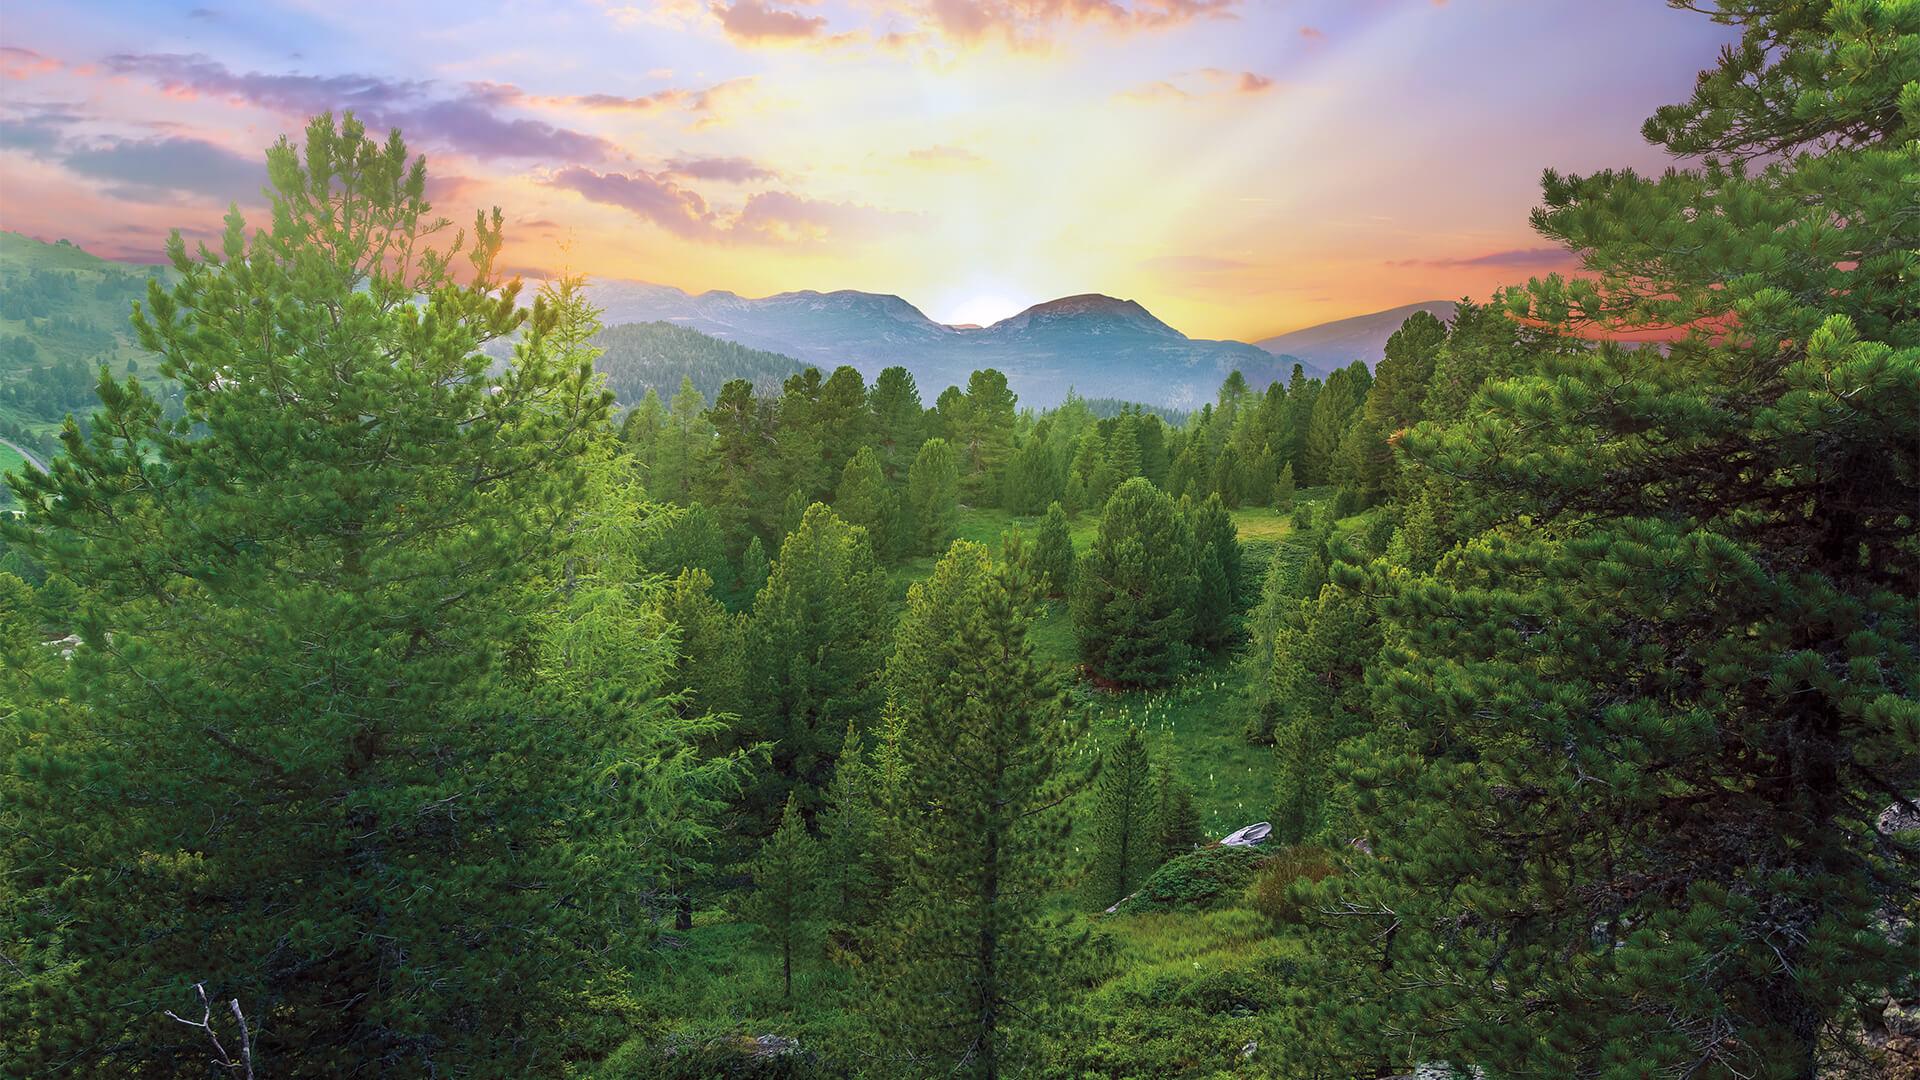 Zirbenkiefernwald bei Sonnenuntergang hinter den Bergen